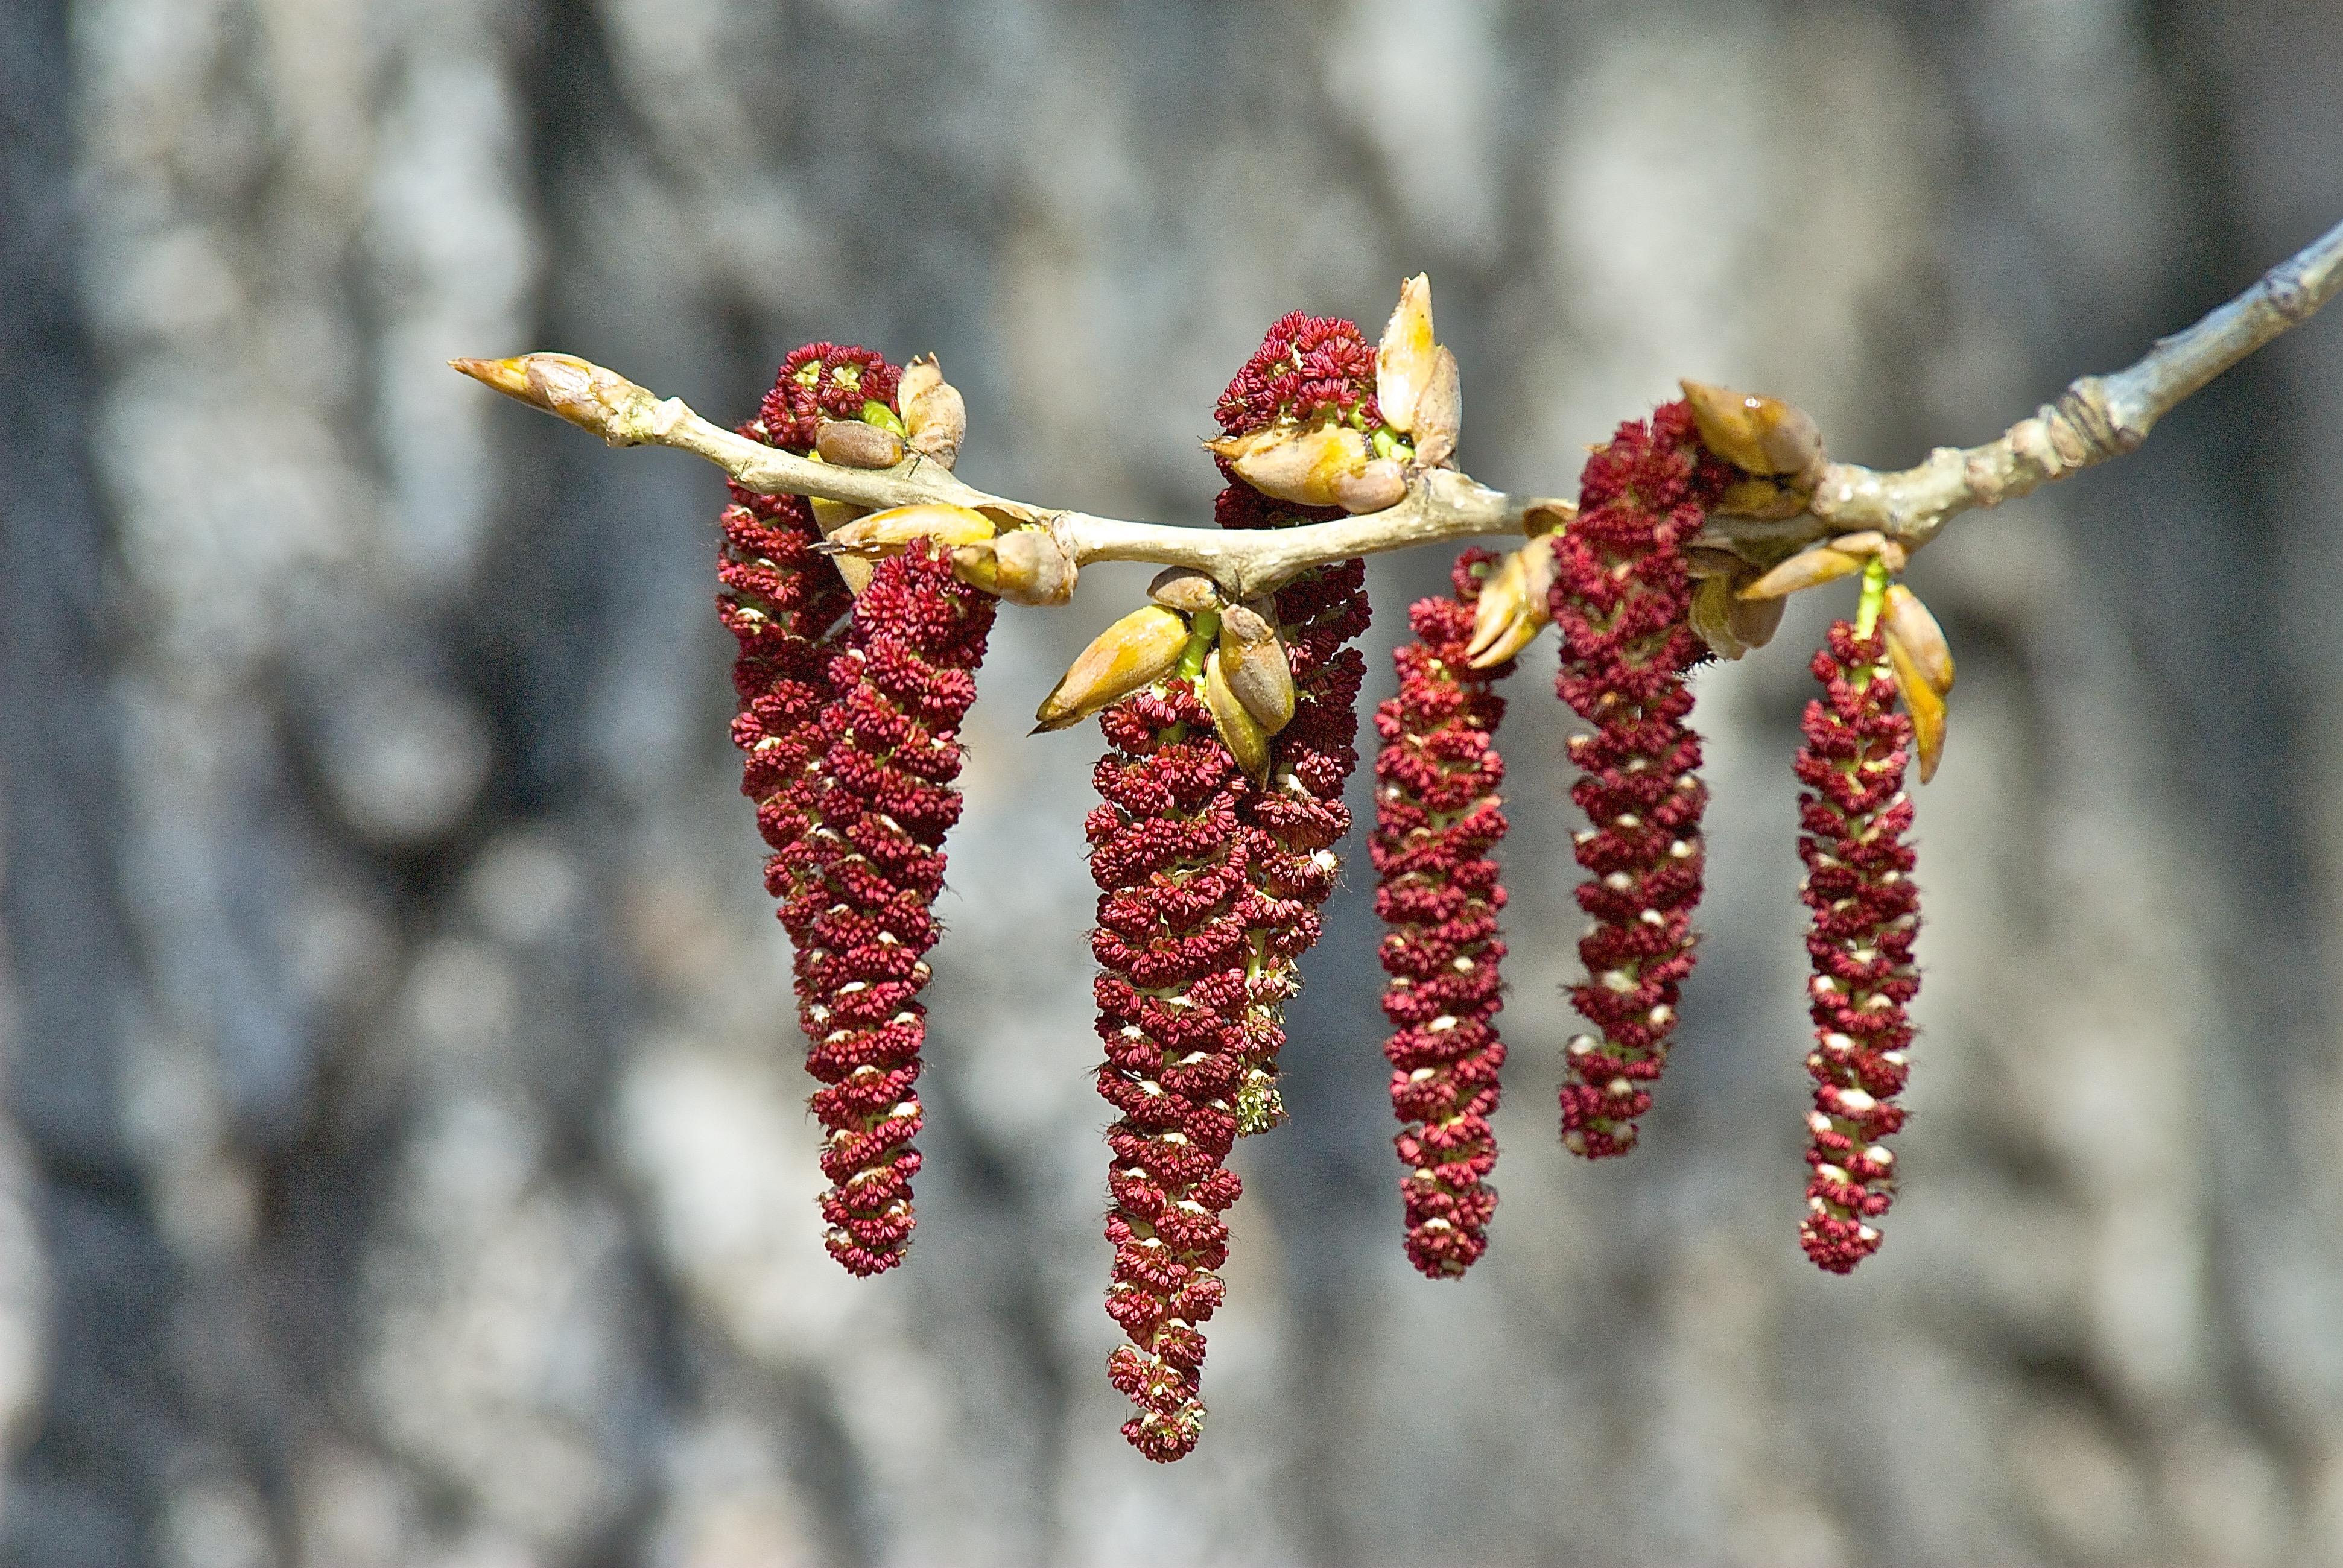 Cottonwood Catkins ♂ (Populus sargentii)